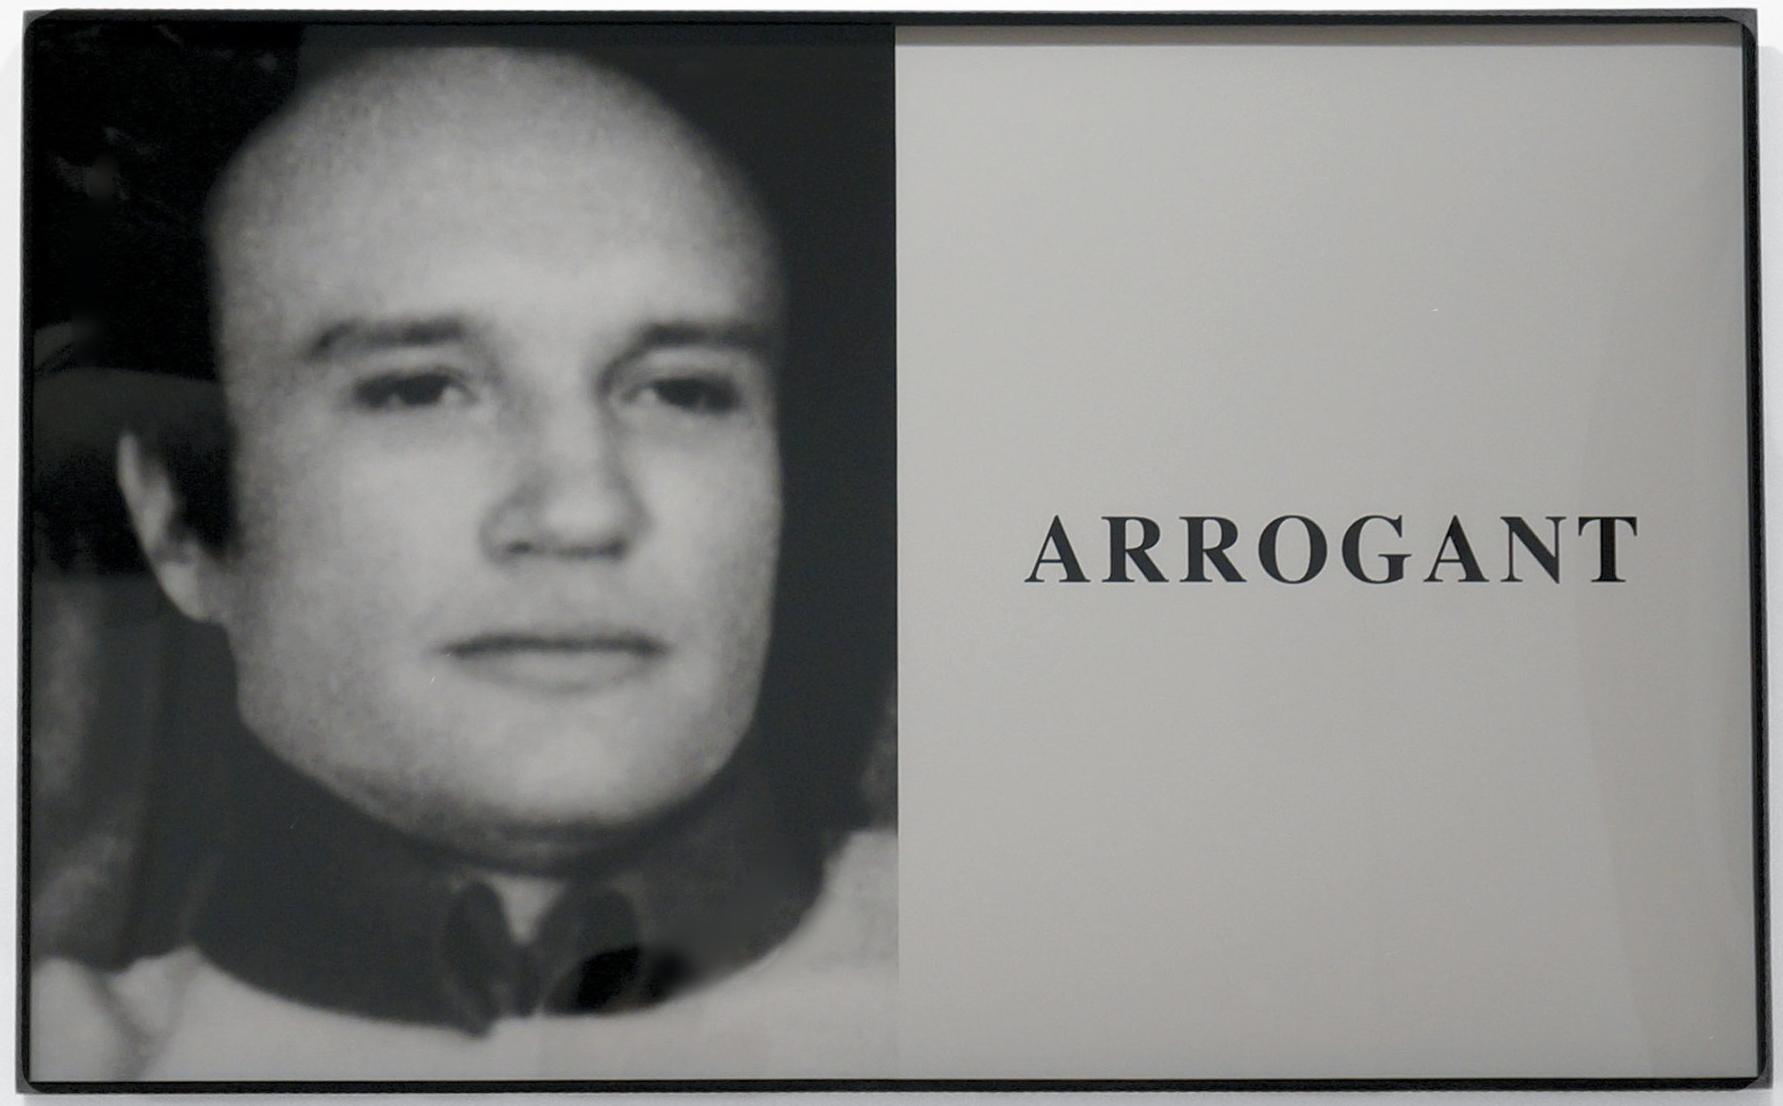 John Baldessari, Prima Facie: Arrogant, 2005